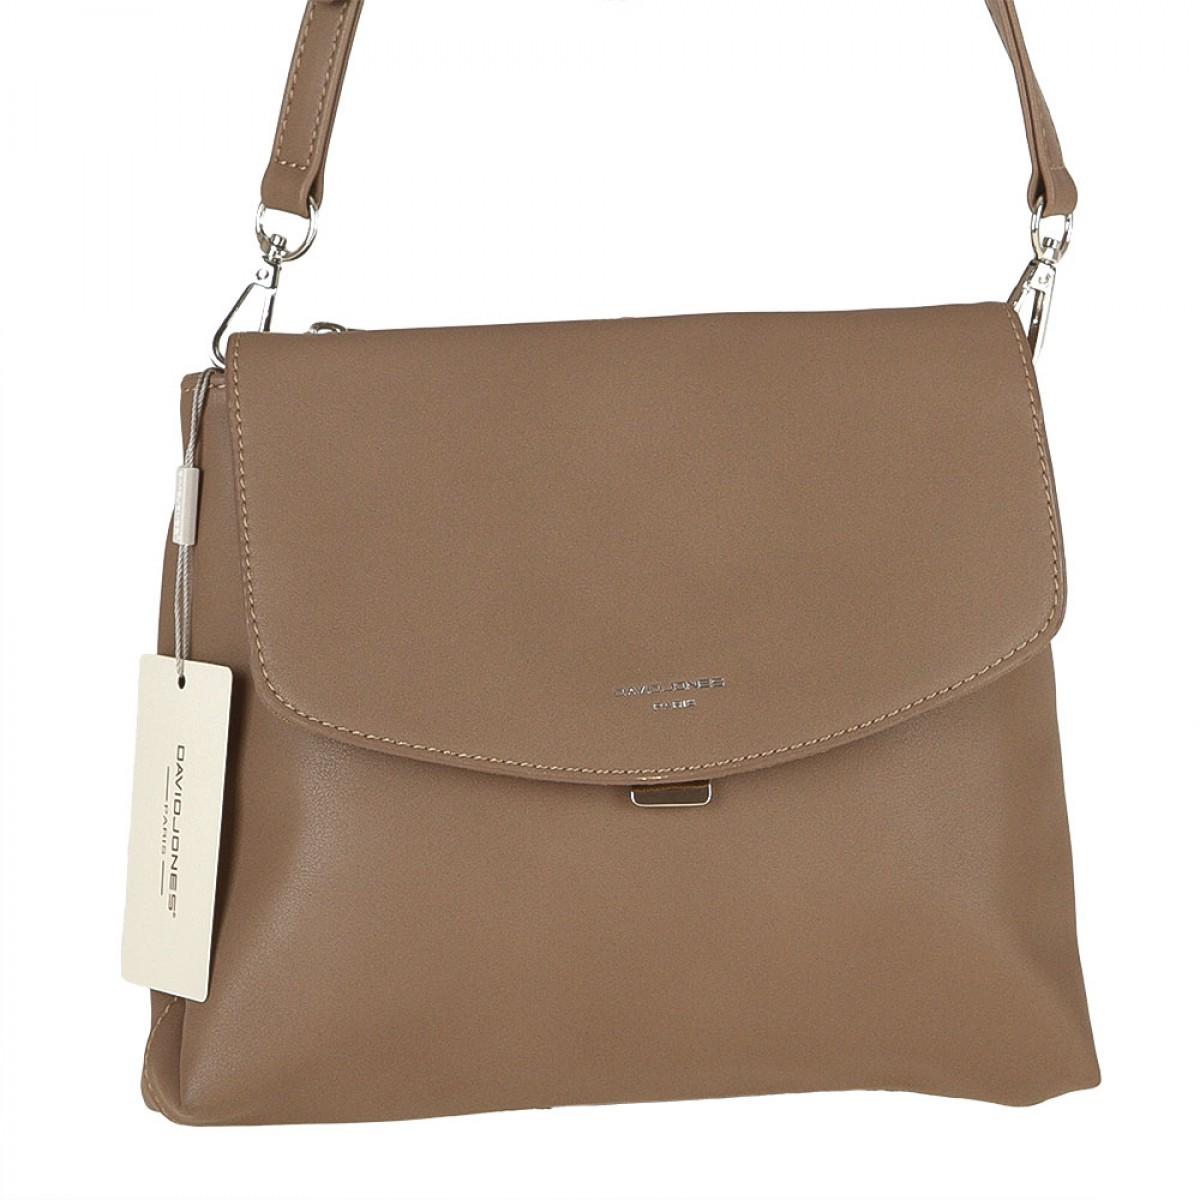 Жіноча сумка David Jones 5619-1 D.CAMEL